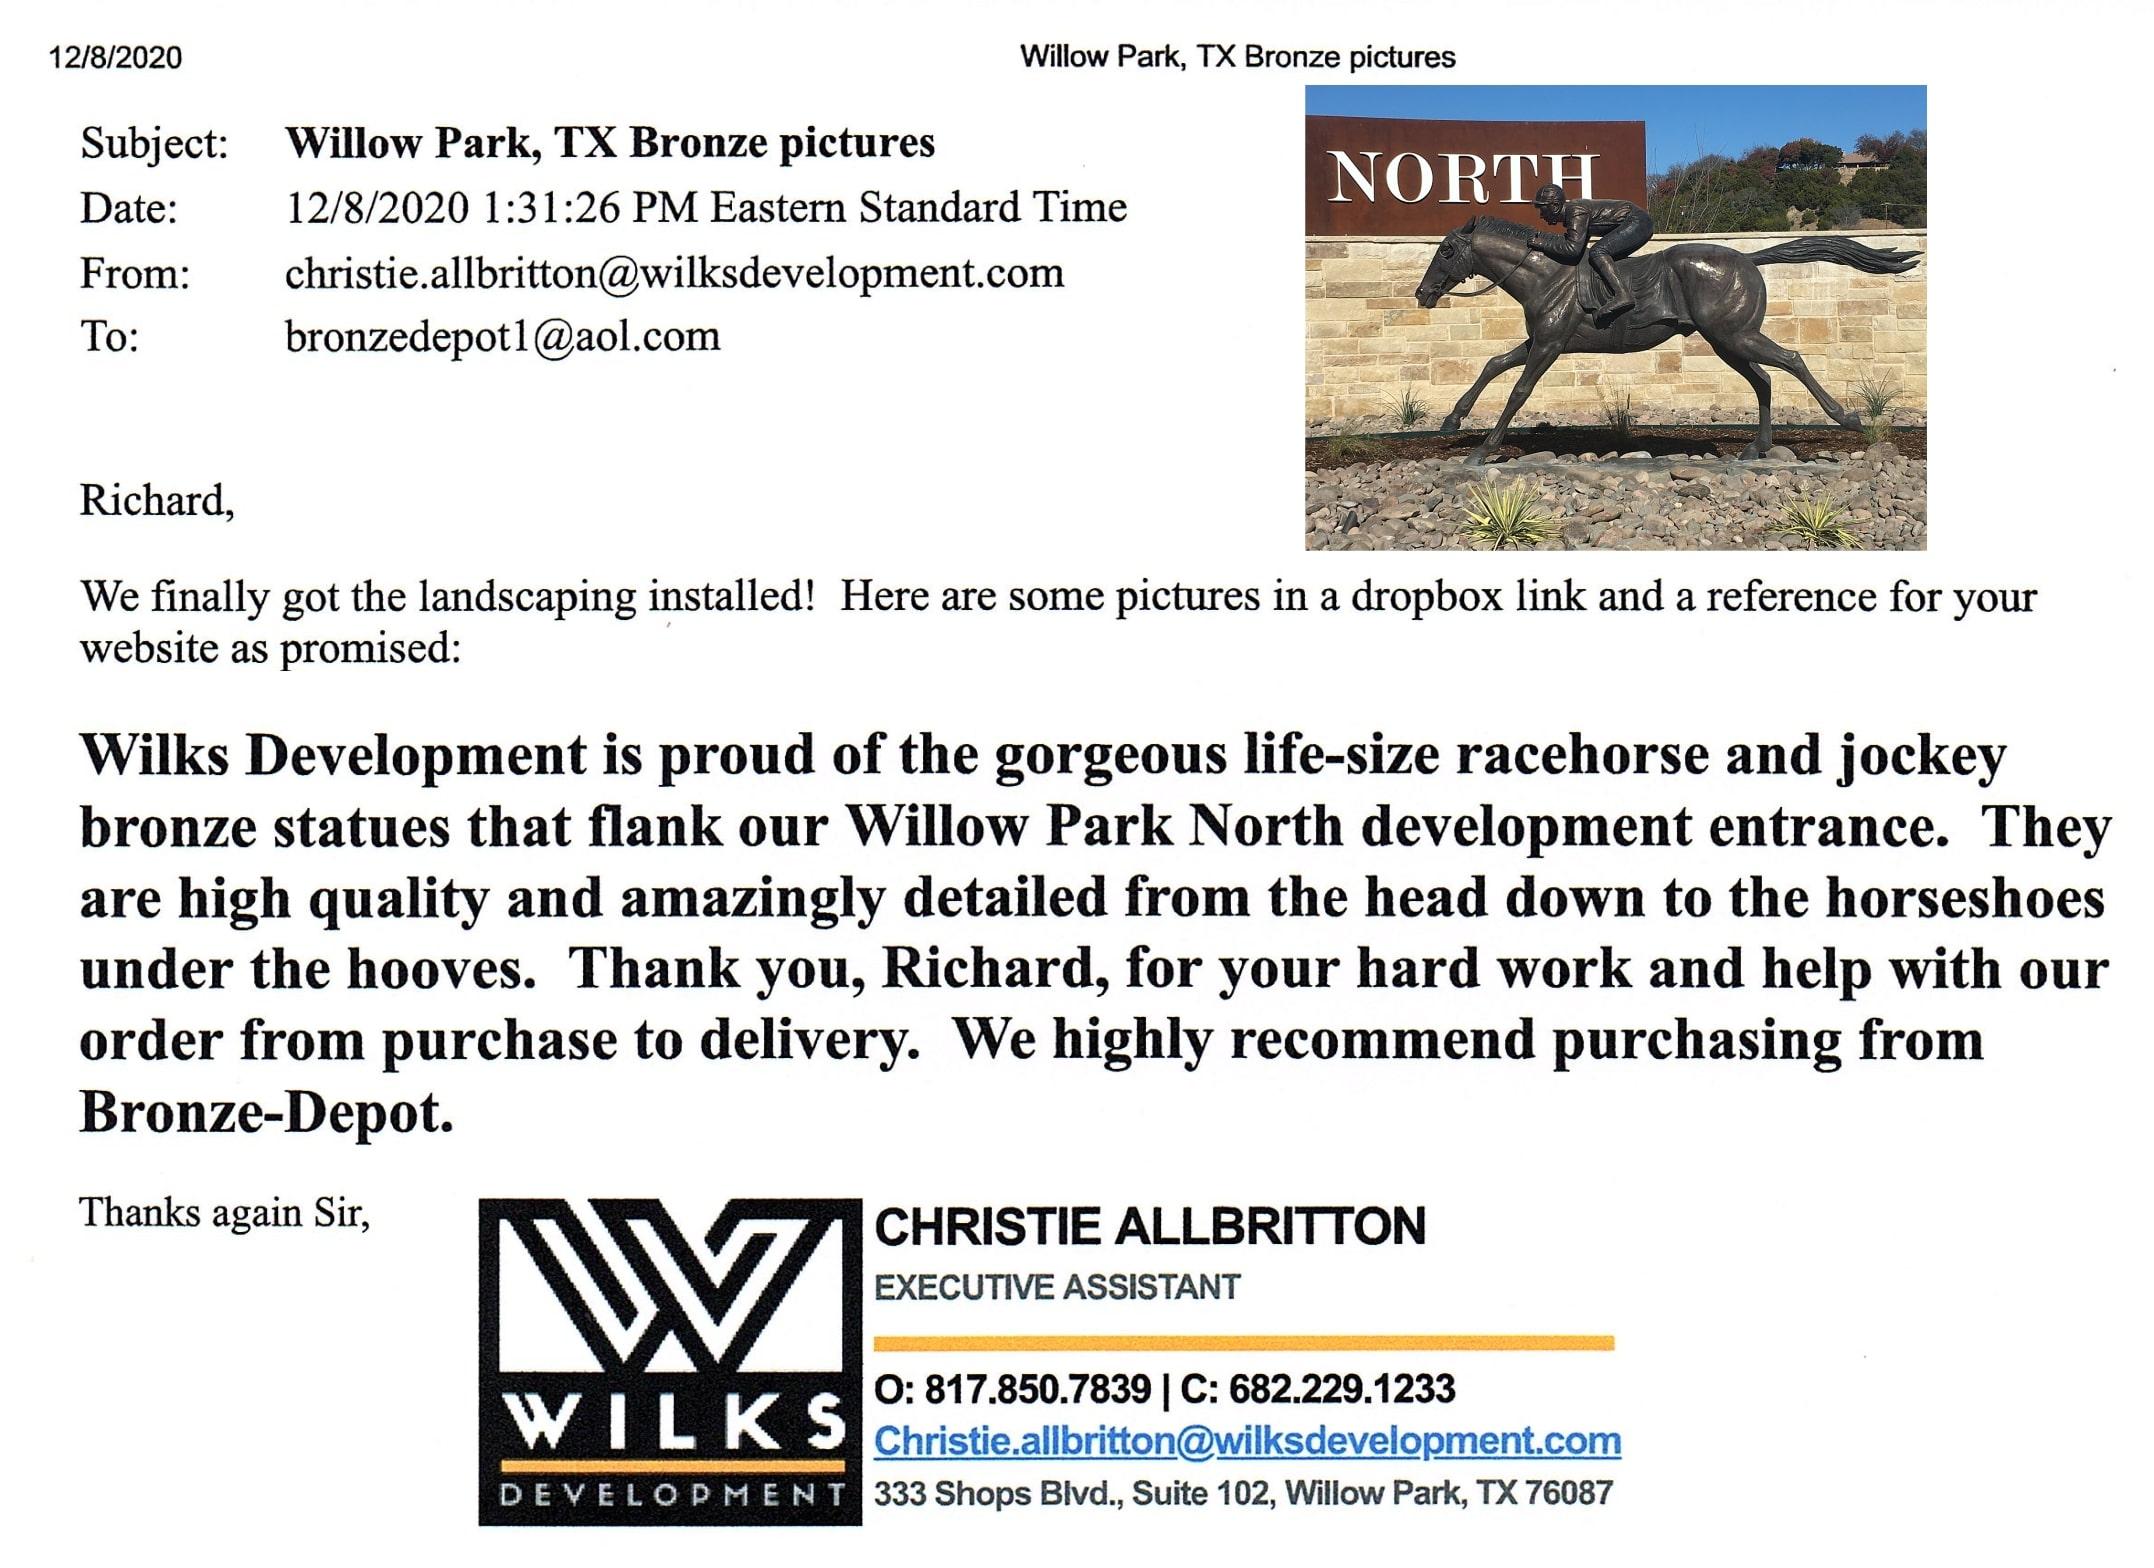 Wilks Development